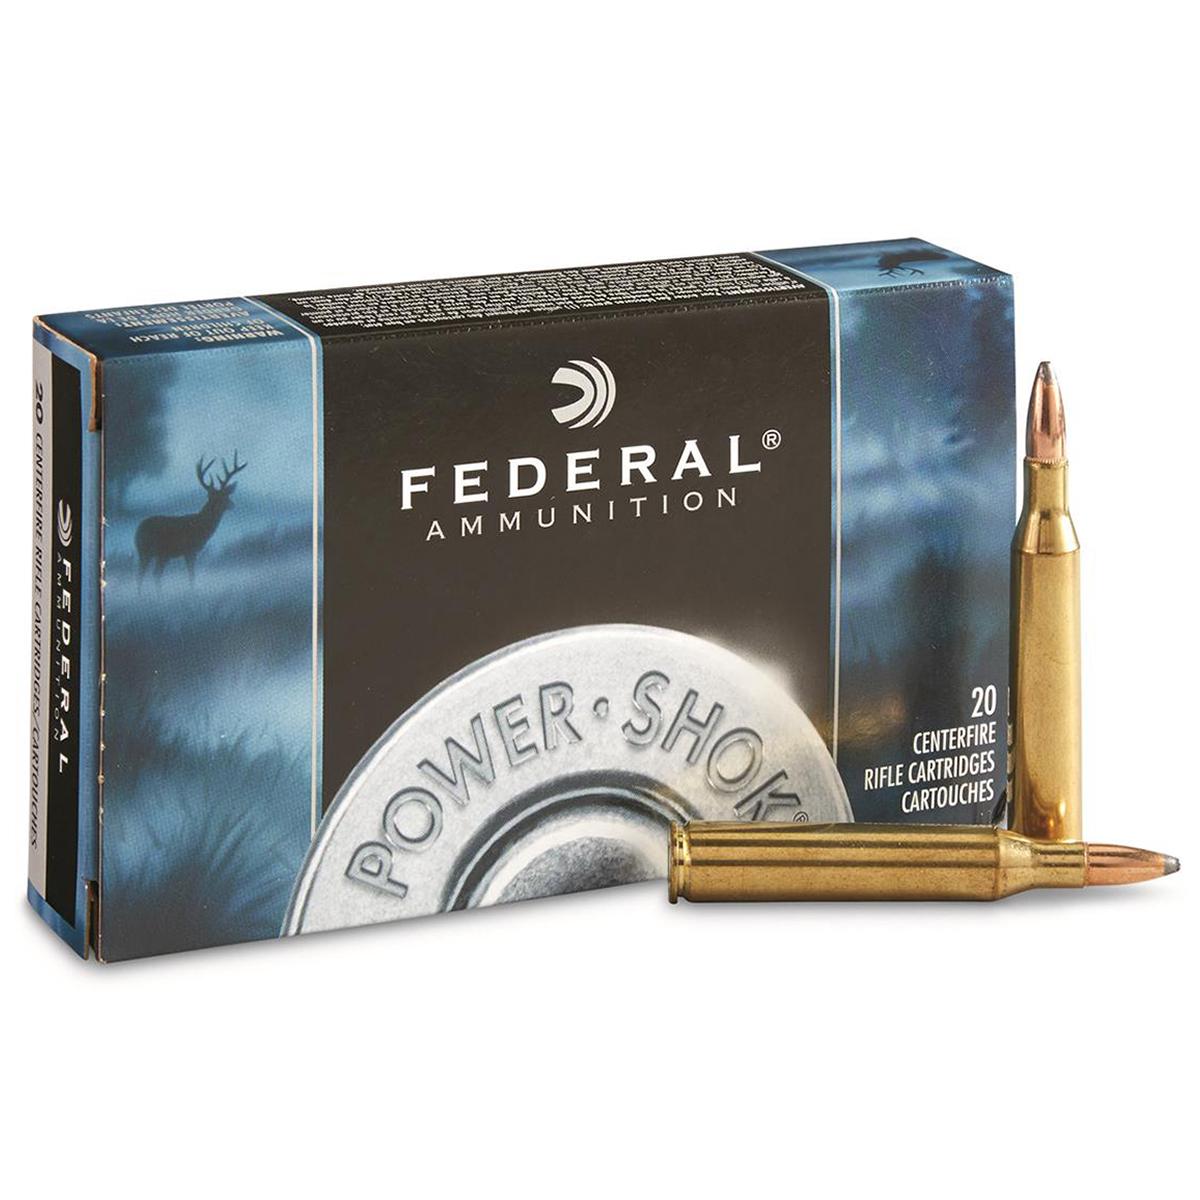 Federal Power-Shok Rifle Ammo, .30-30 Win, 150-gr, SPFN